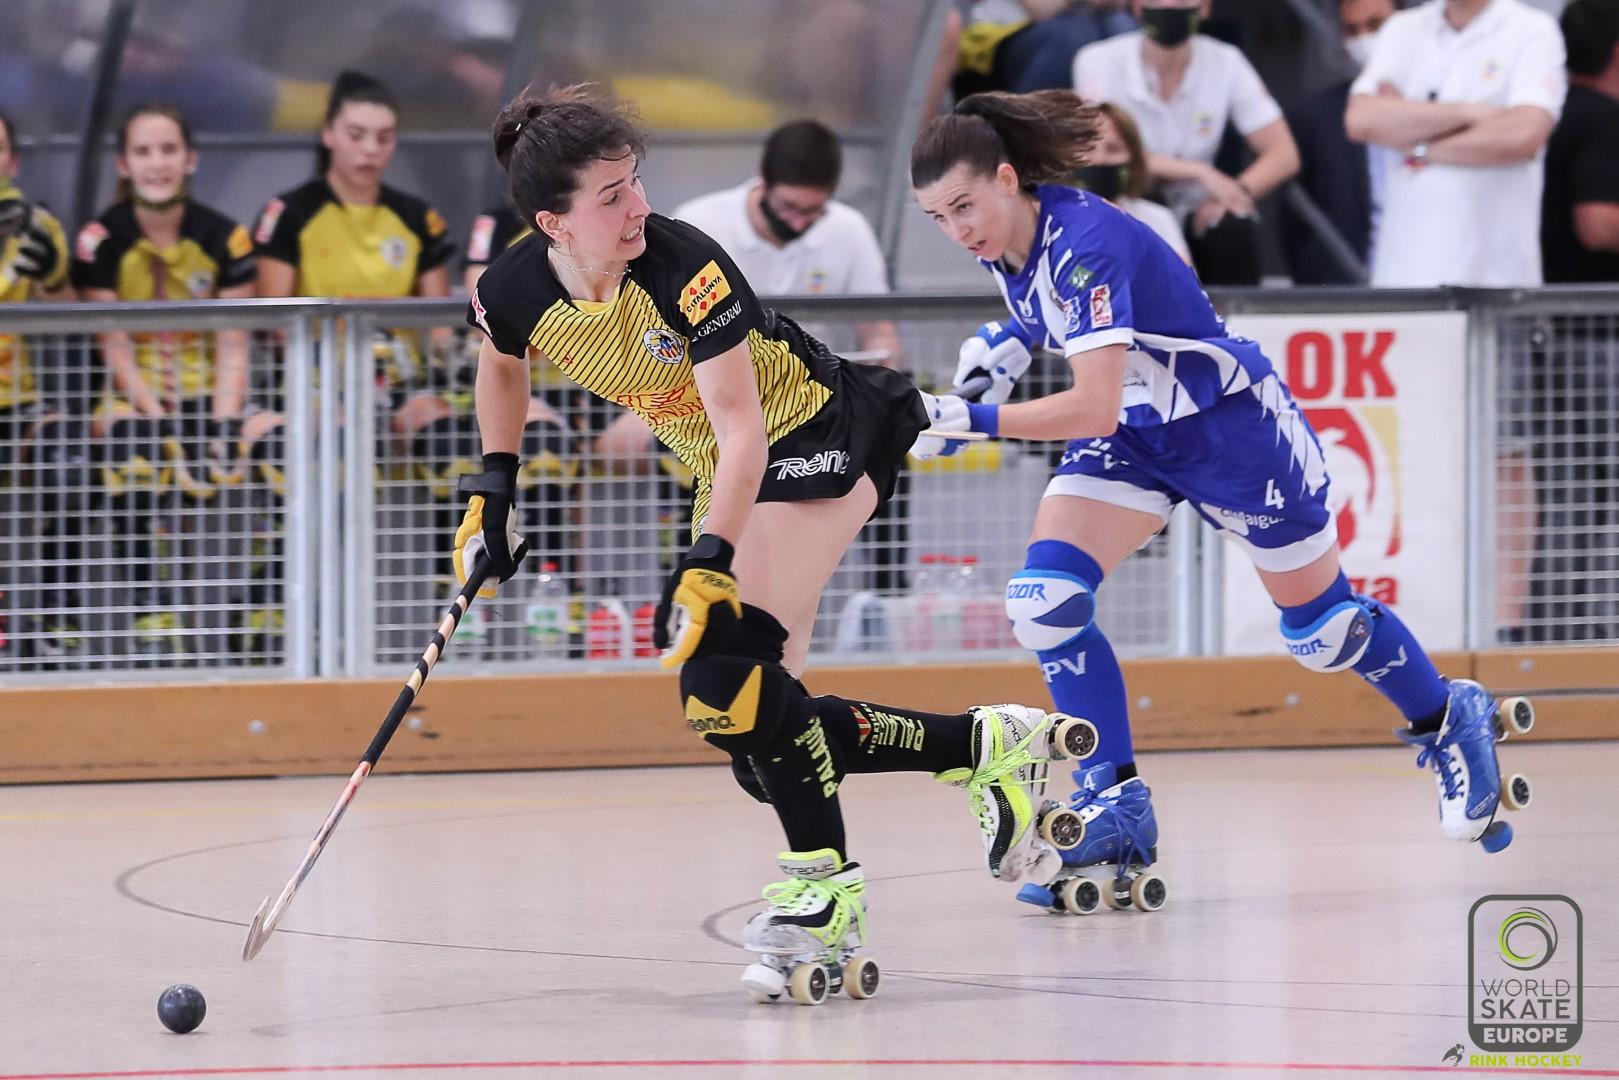 PHOTOS - 30-05-2021 - FEMALE LEAGUE CUP - Match #019 - Generali HC Palau (SP) x CP Voltregà (SP)